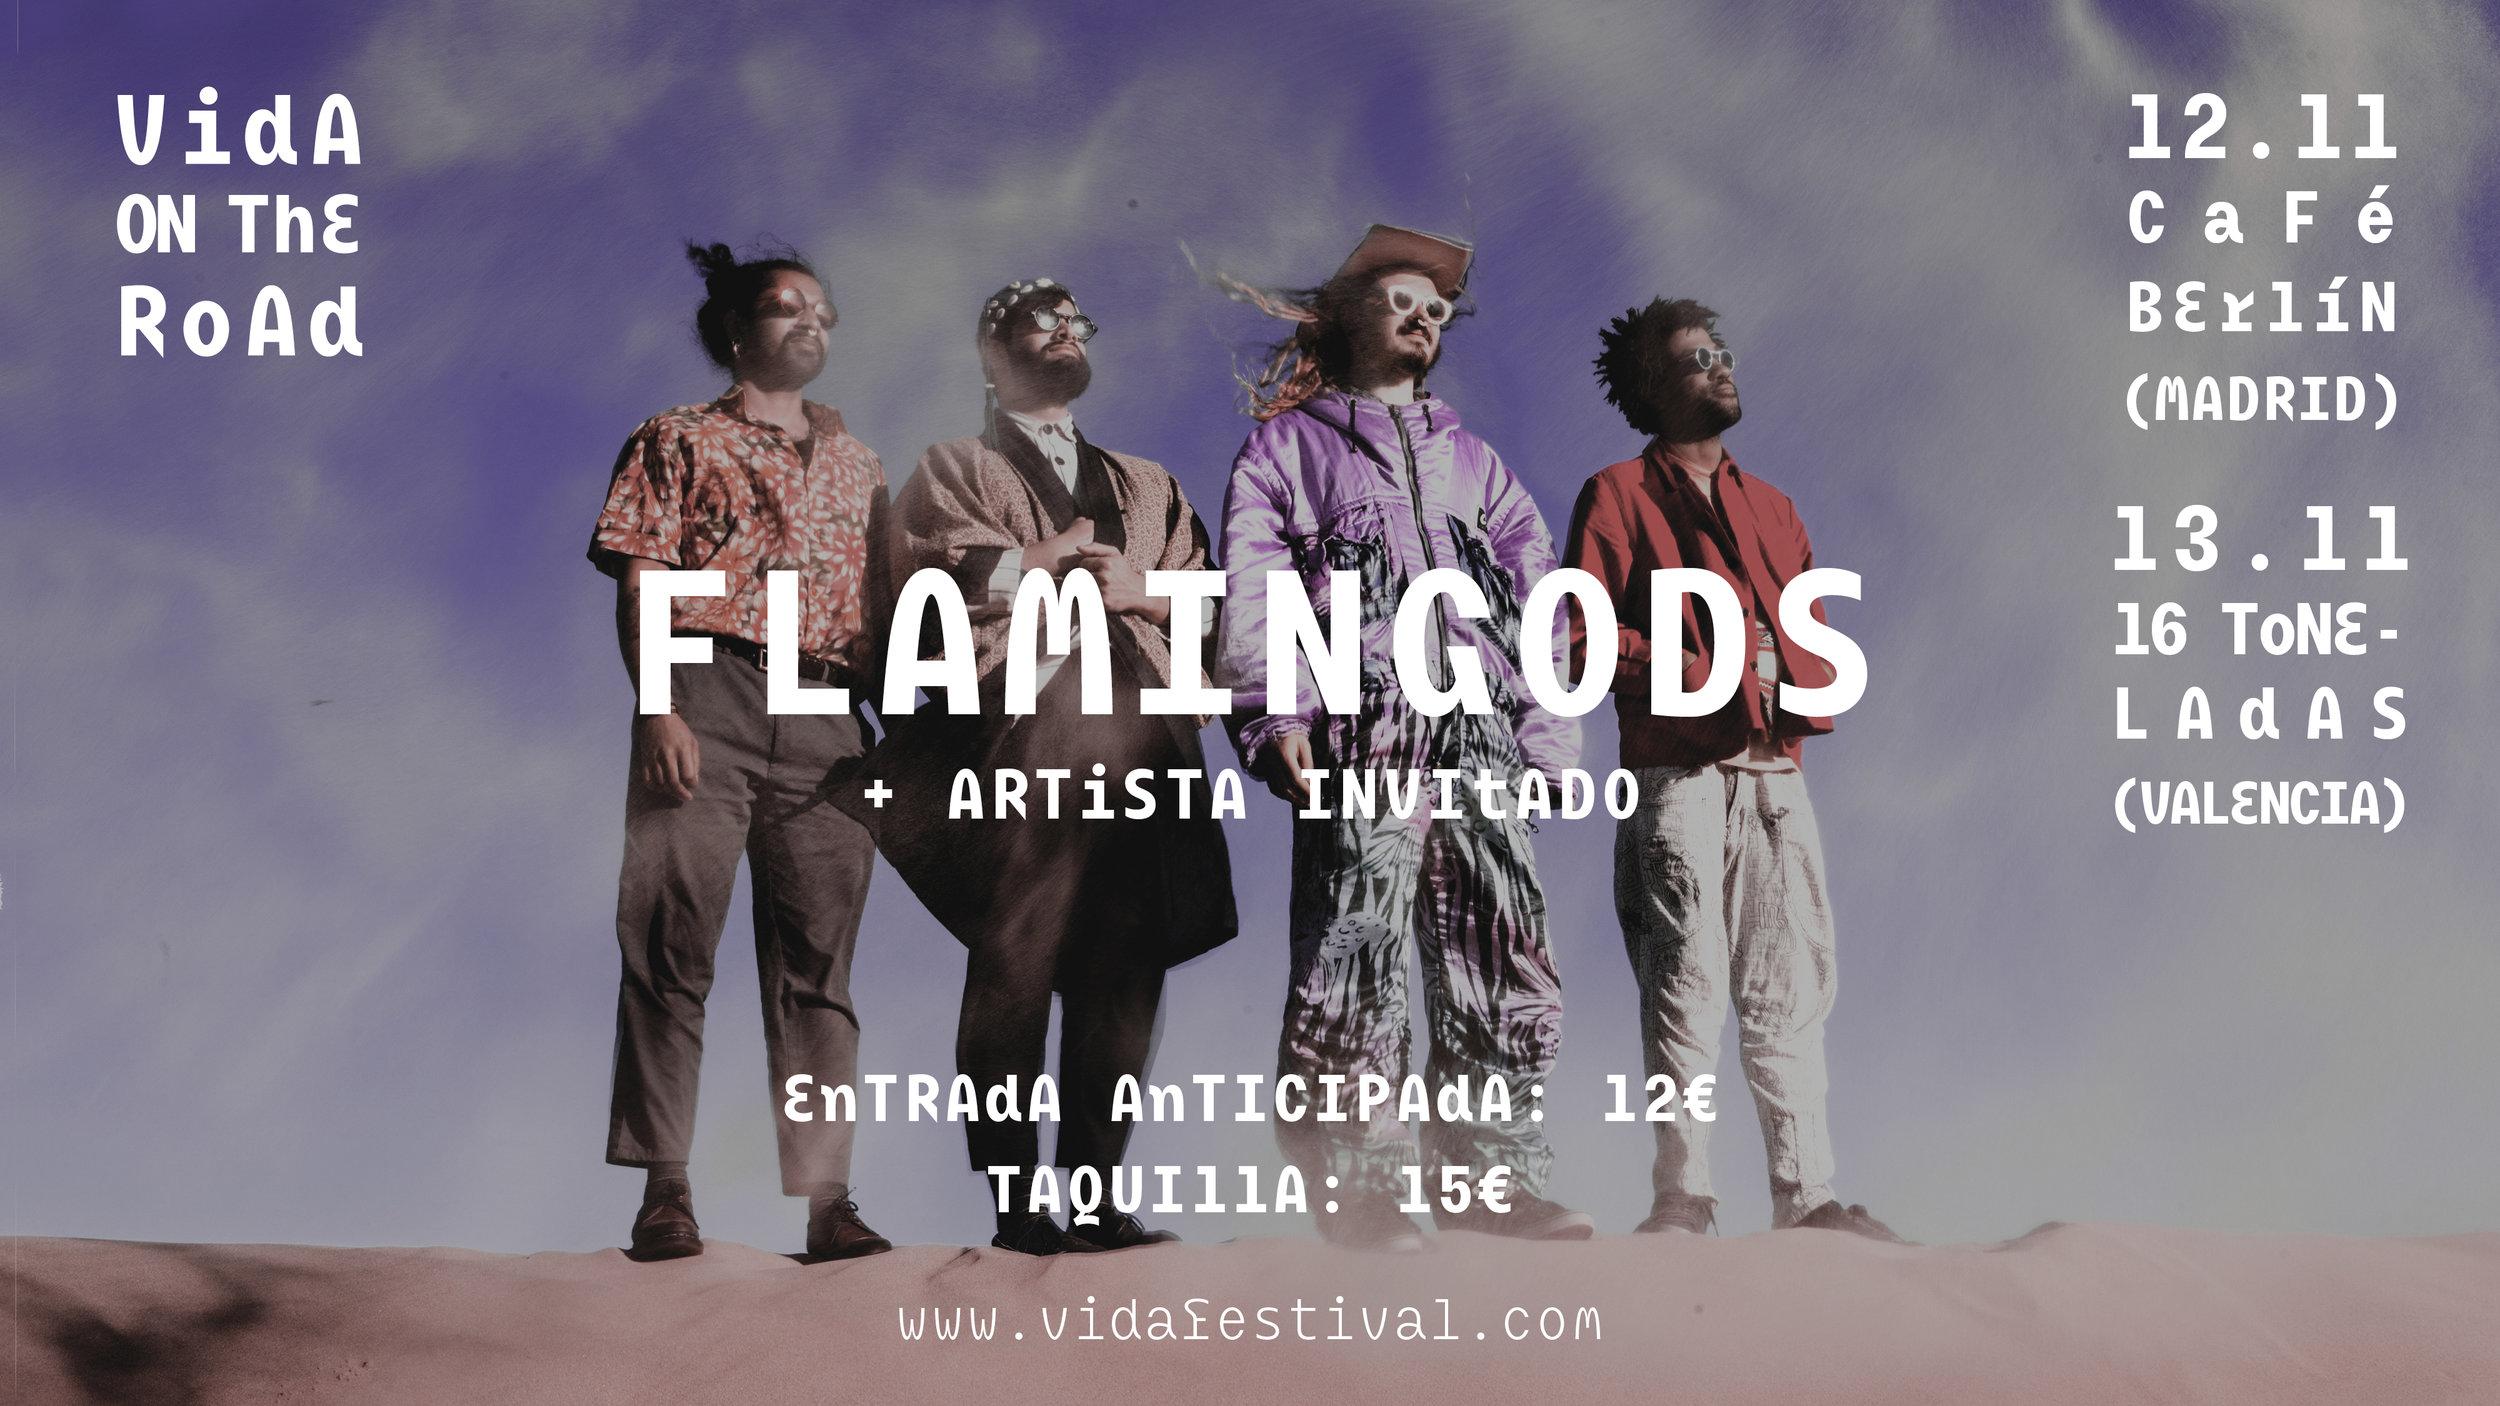 FlamingodsVidaOnTheRoad_1920x1080_V3.jpg